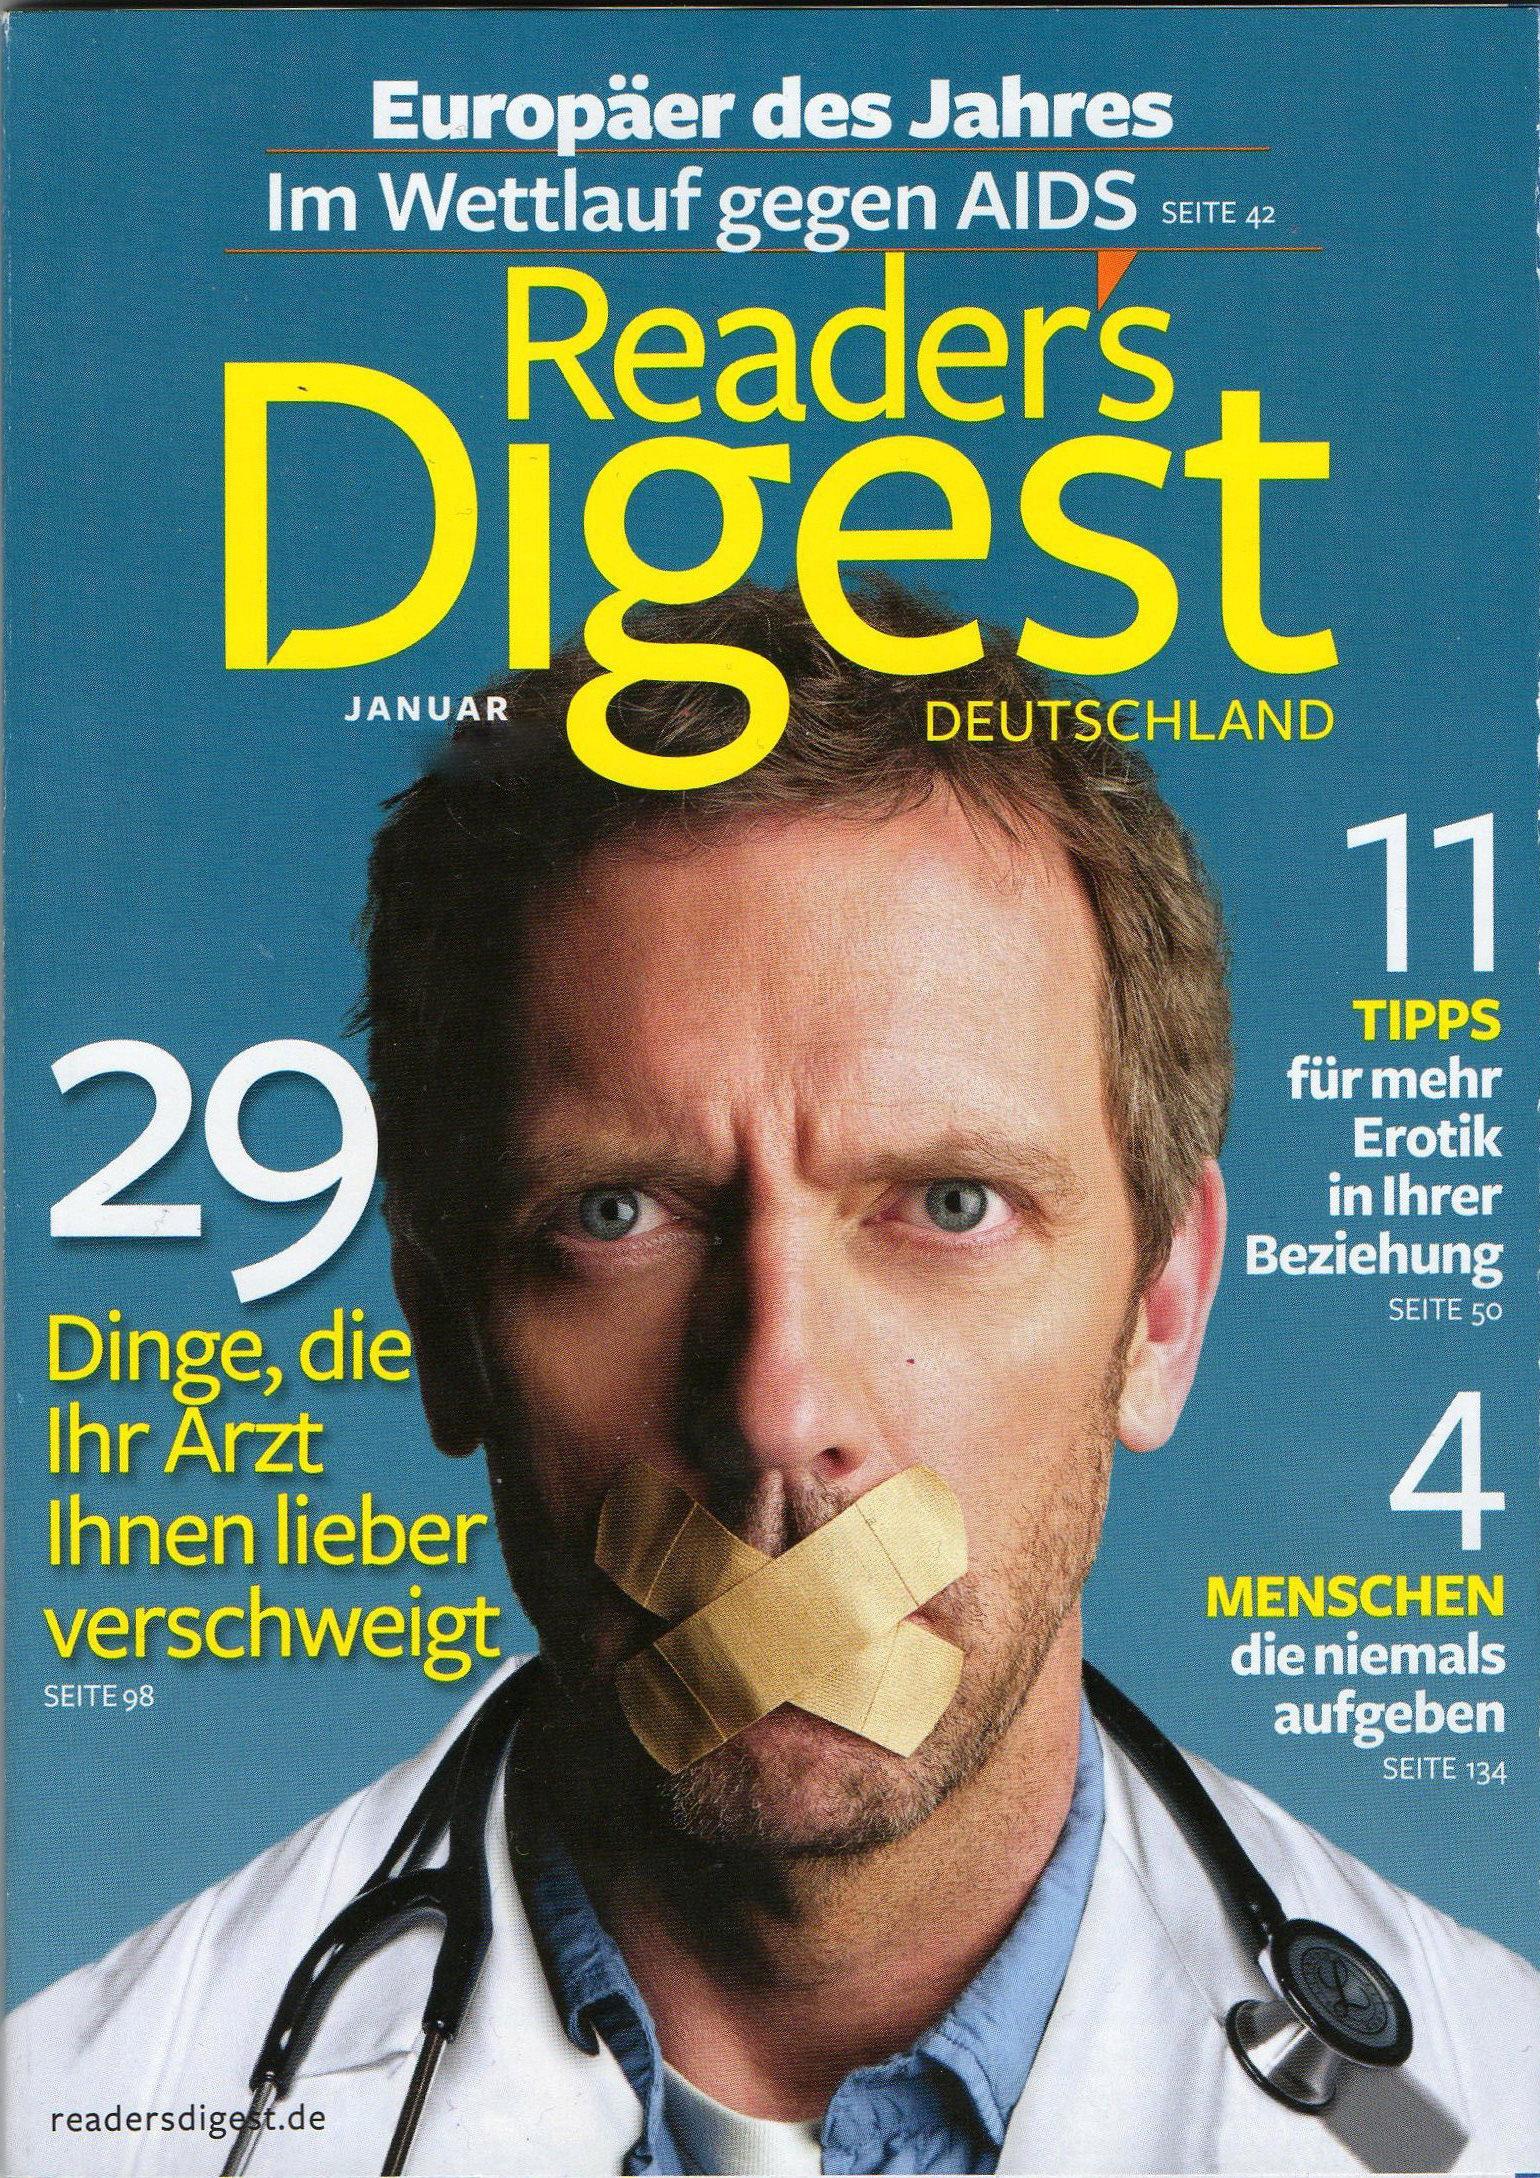 readers digest magzine 4 - HD1540×2178